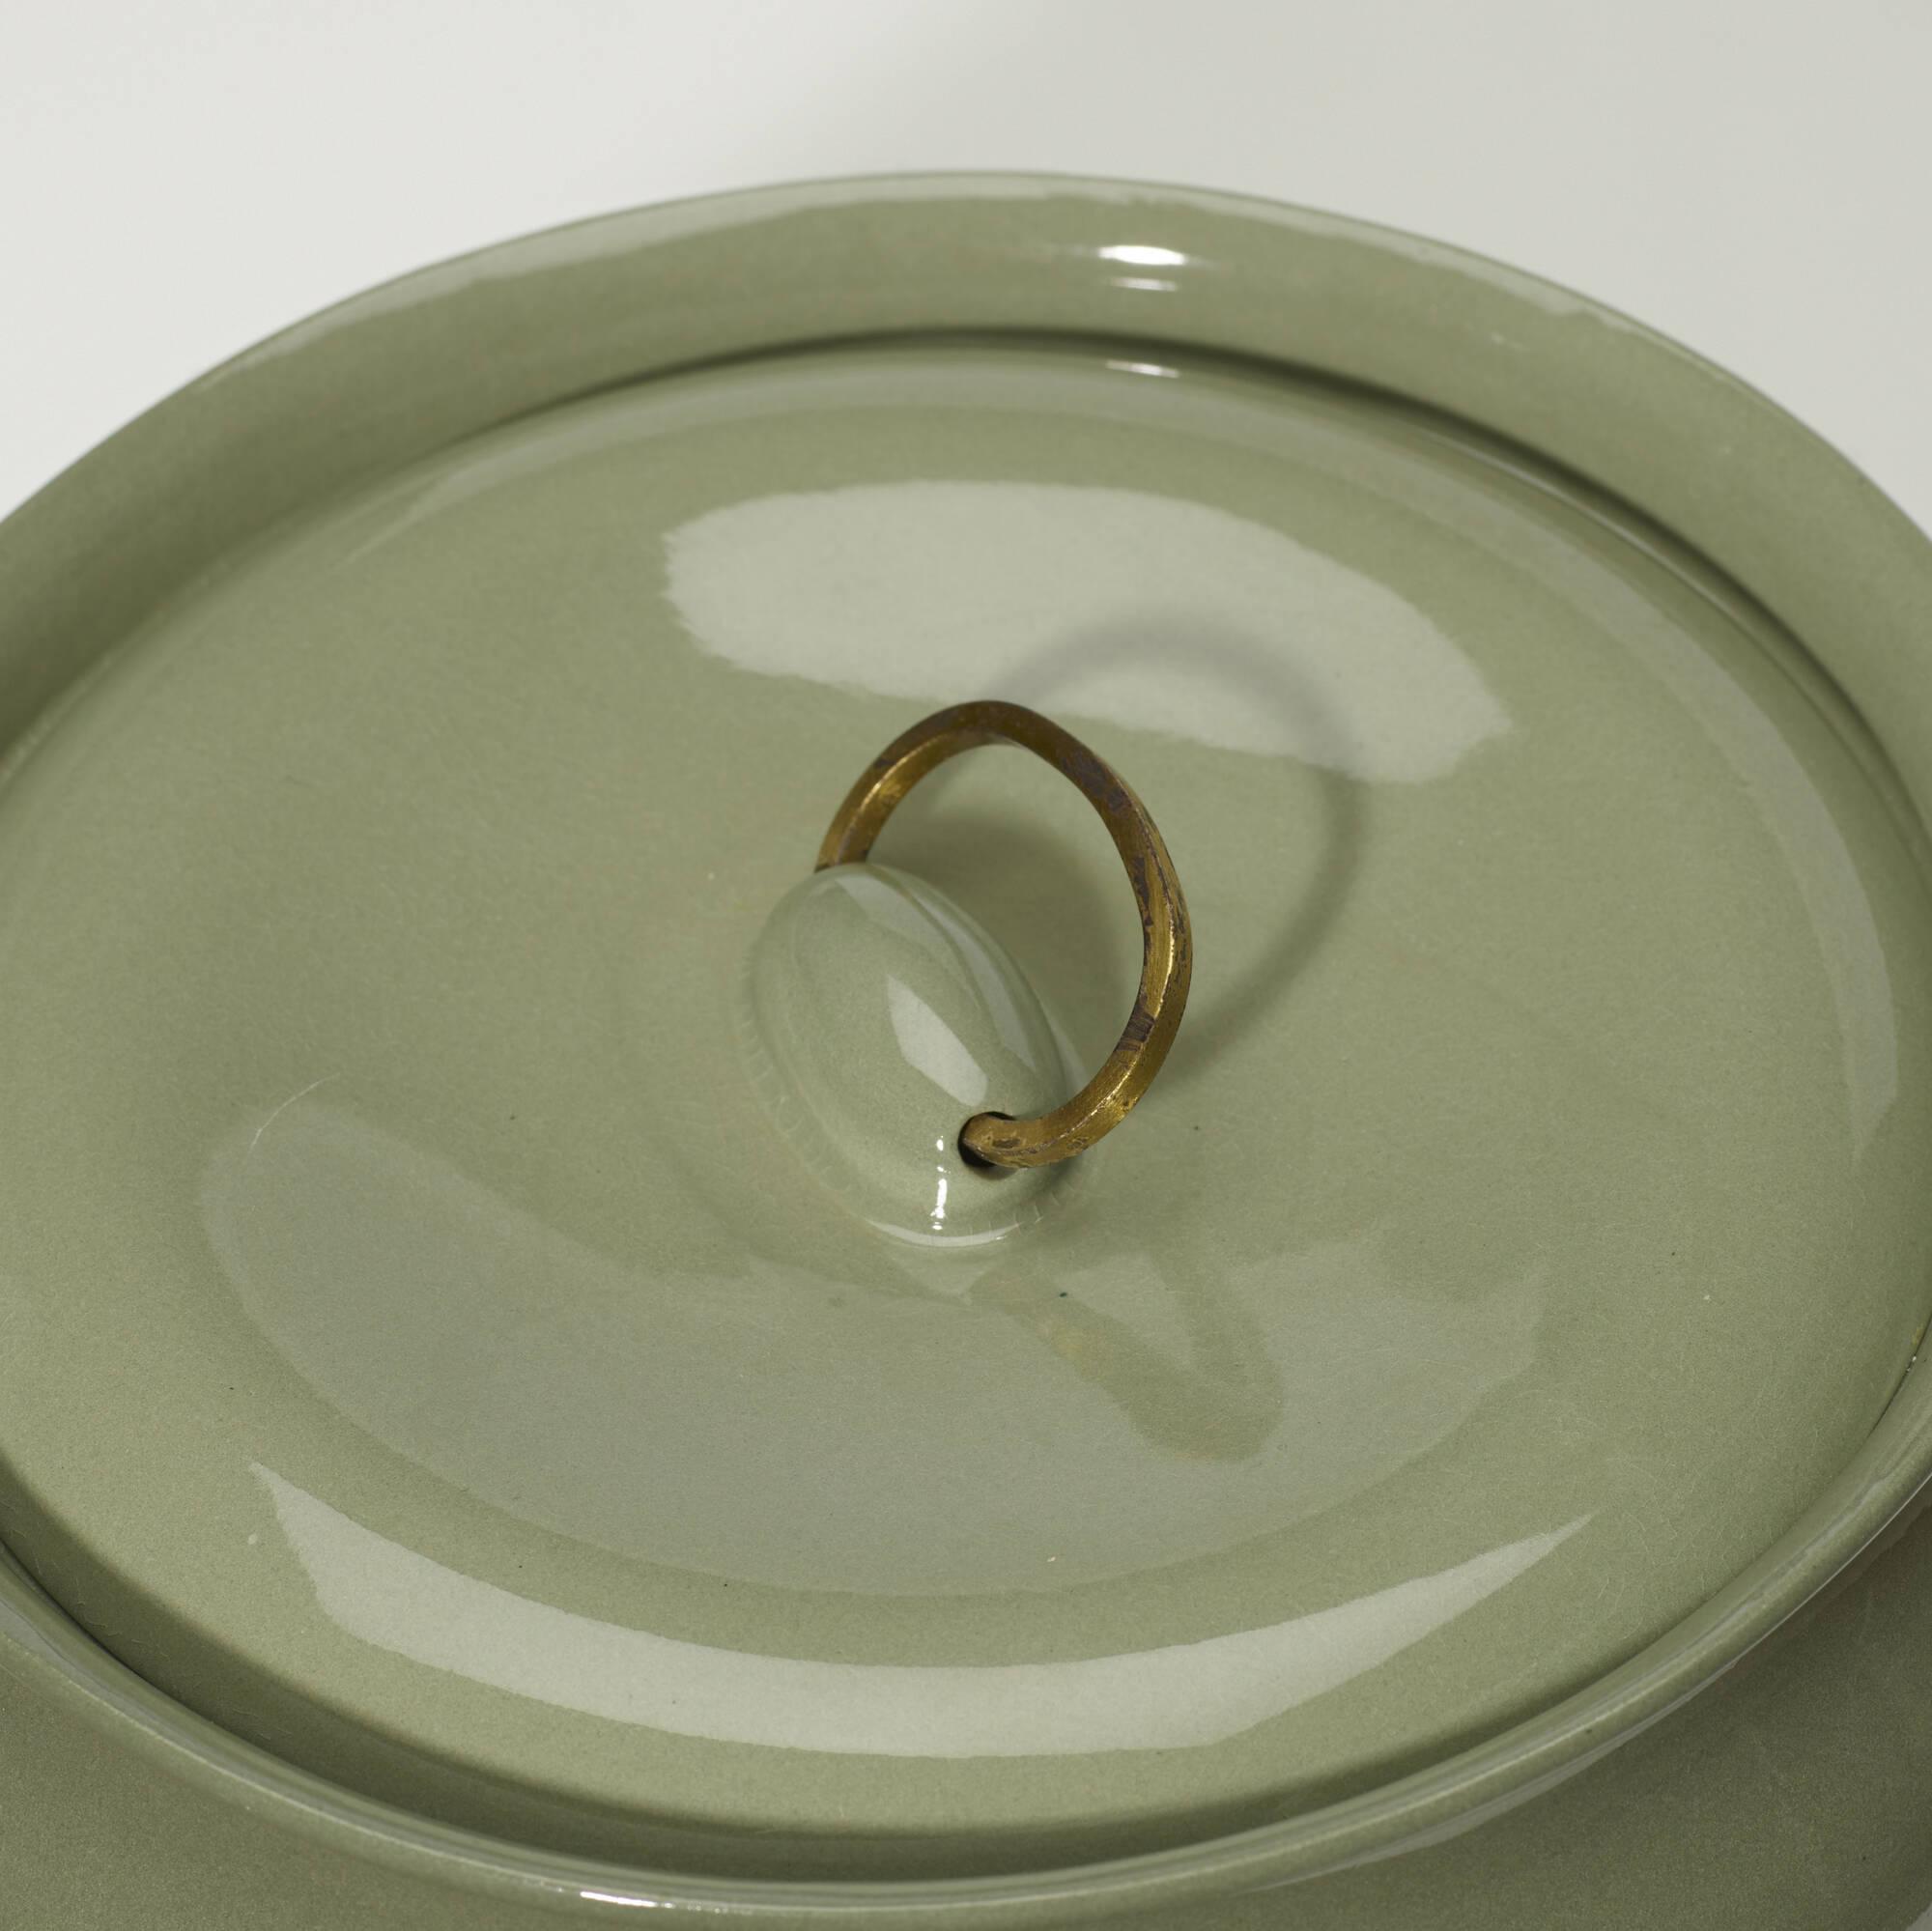 334: Eva Zeisel / lidded casserole dish (2 of 2)